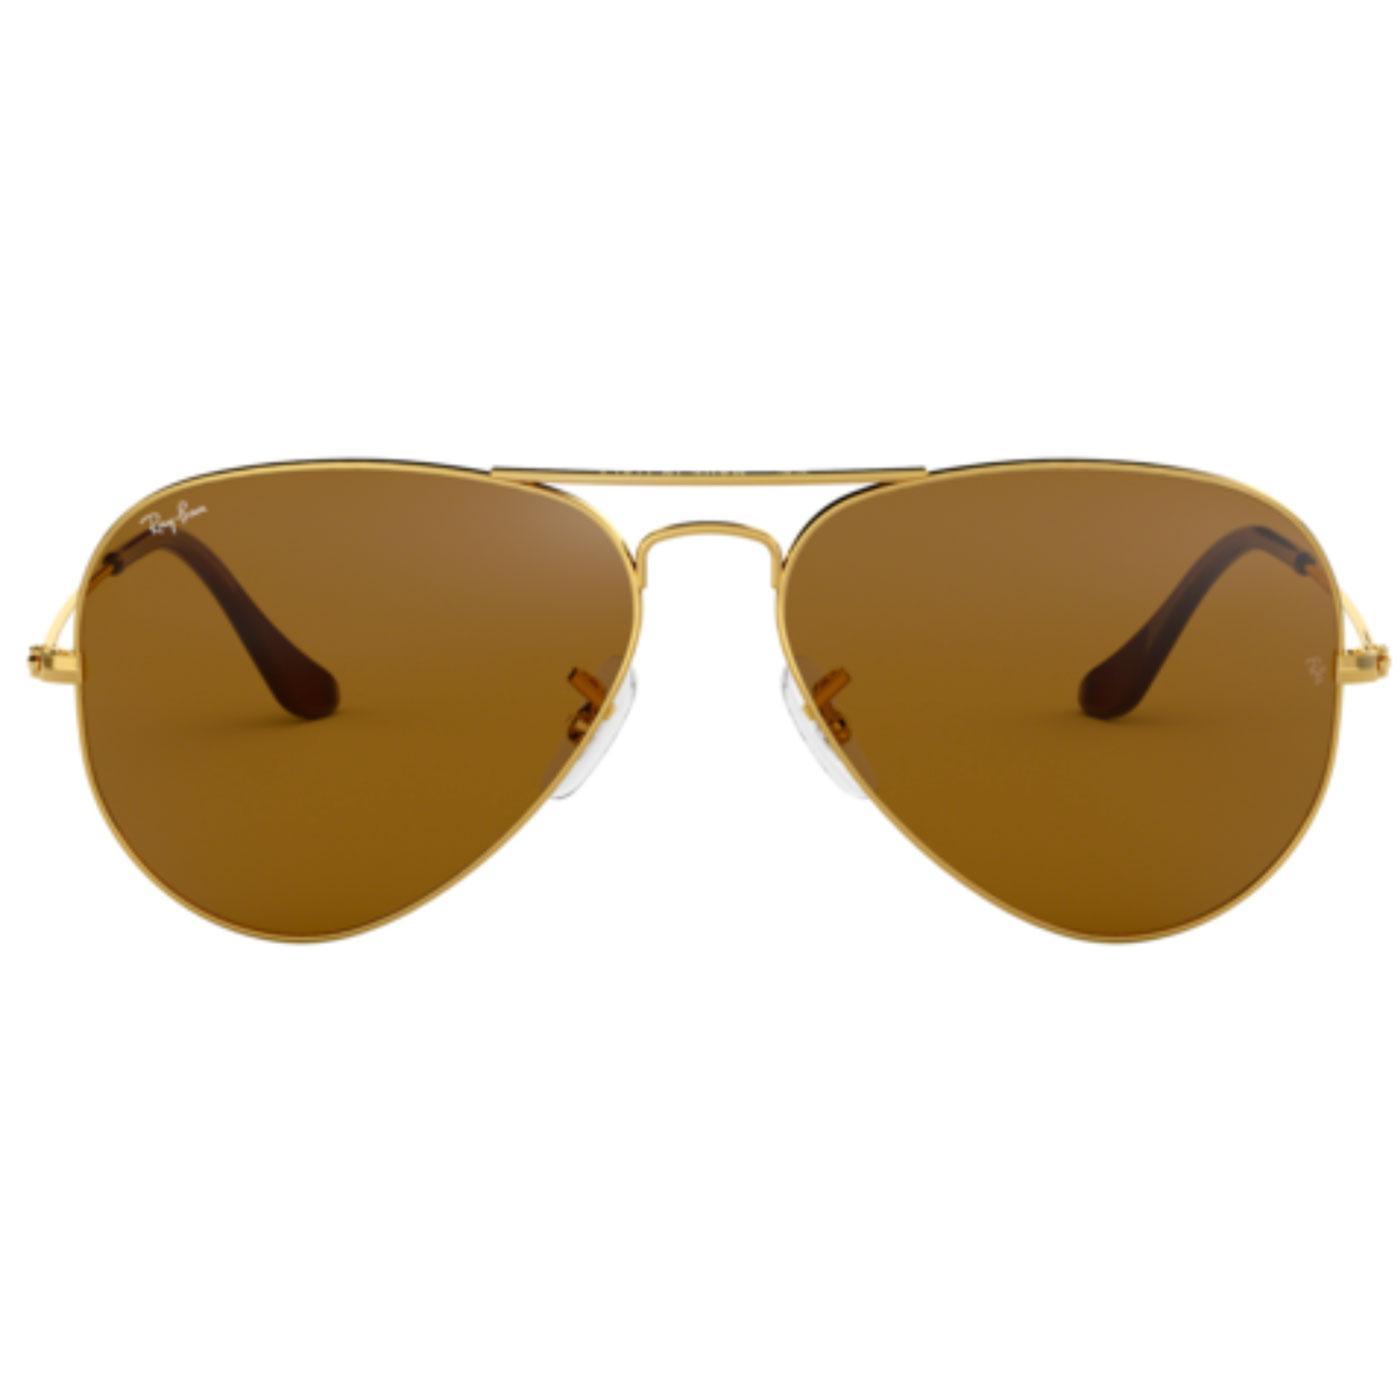 Ray-Ban Aviator Retro Mod Sunglasses in Gold/Brown